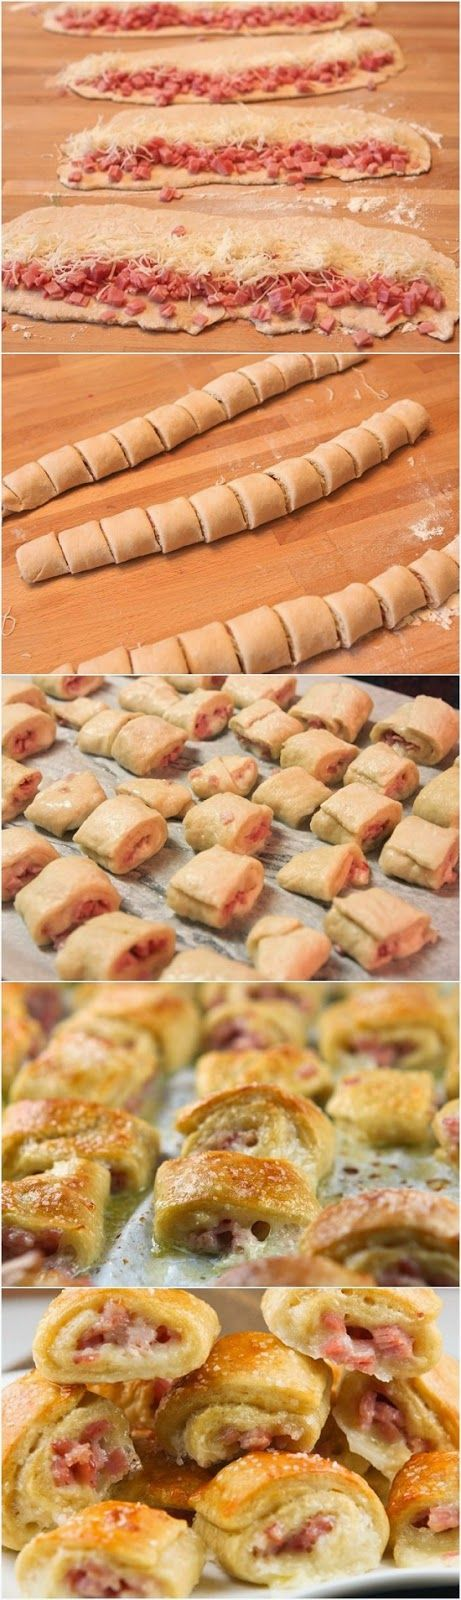 Blog de Alimentos